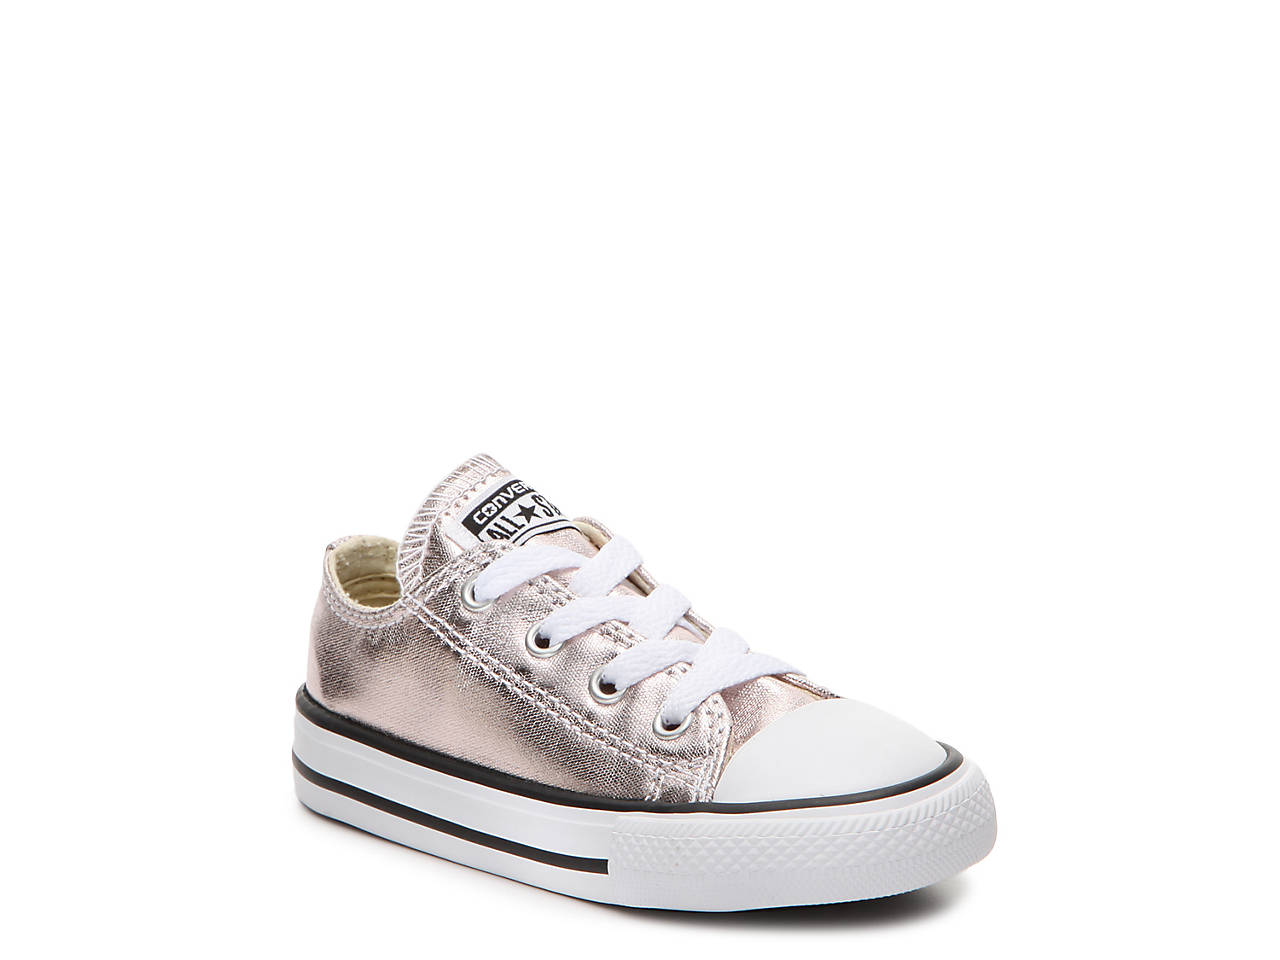 af61f61da4b5 Converse Chuck Taylor All Star Metallic Toddler Sneaker Kids Shoes